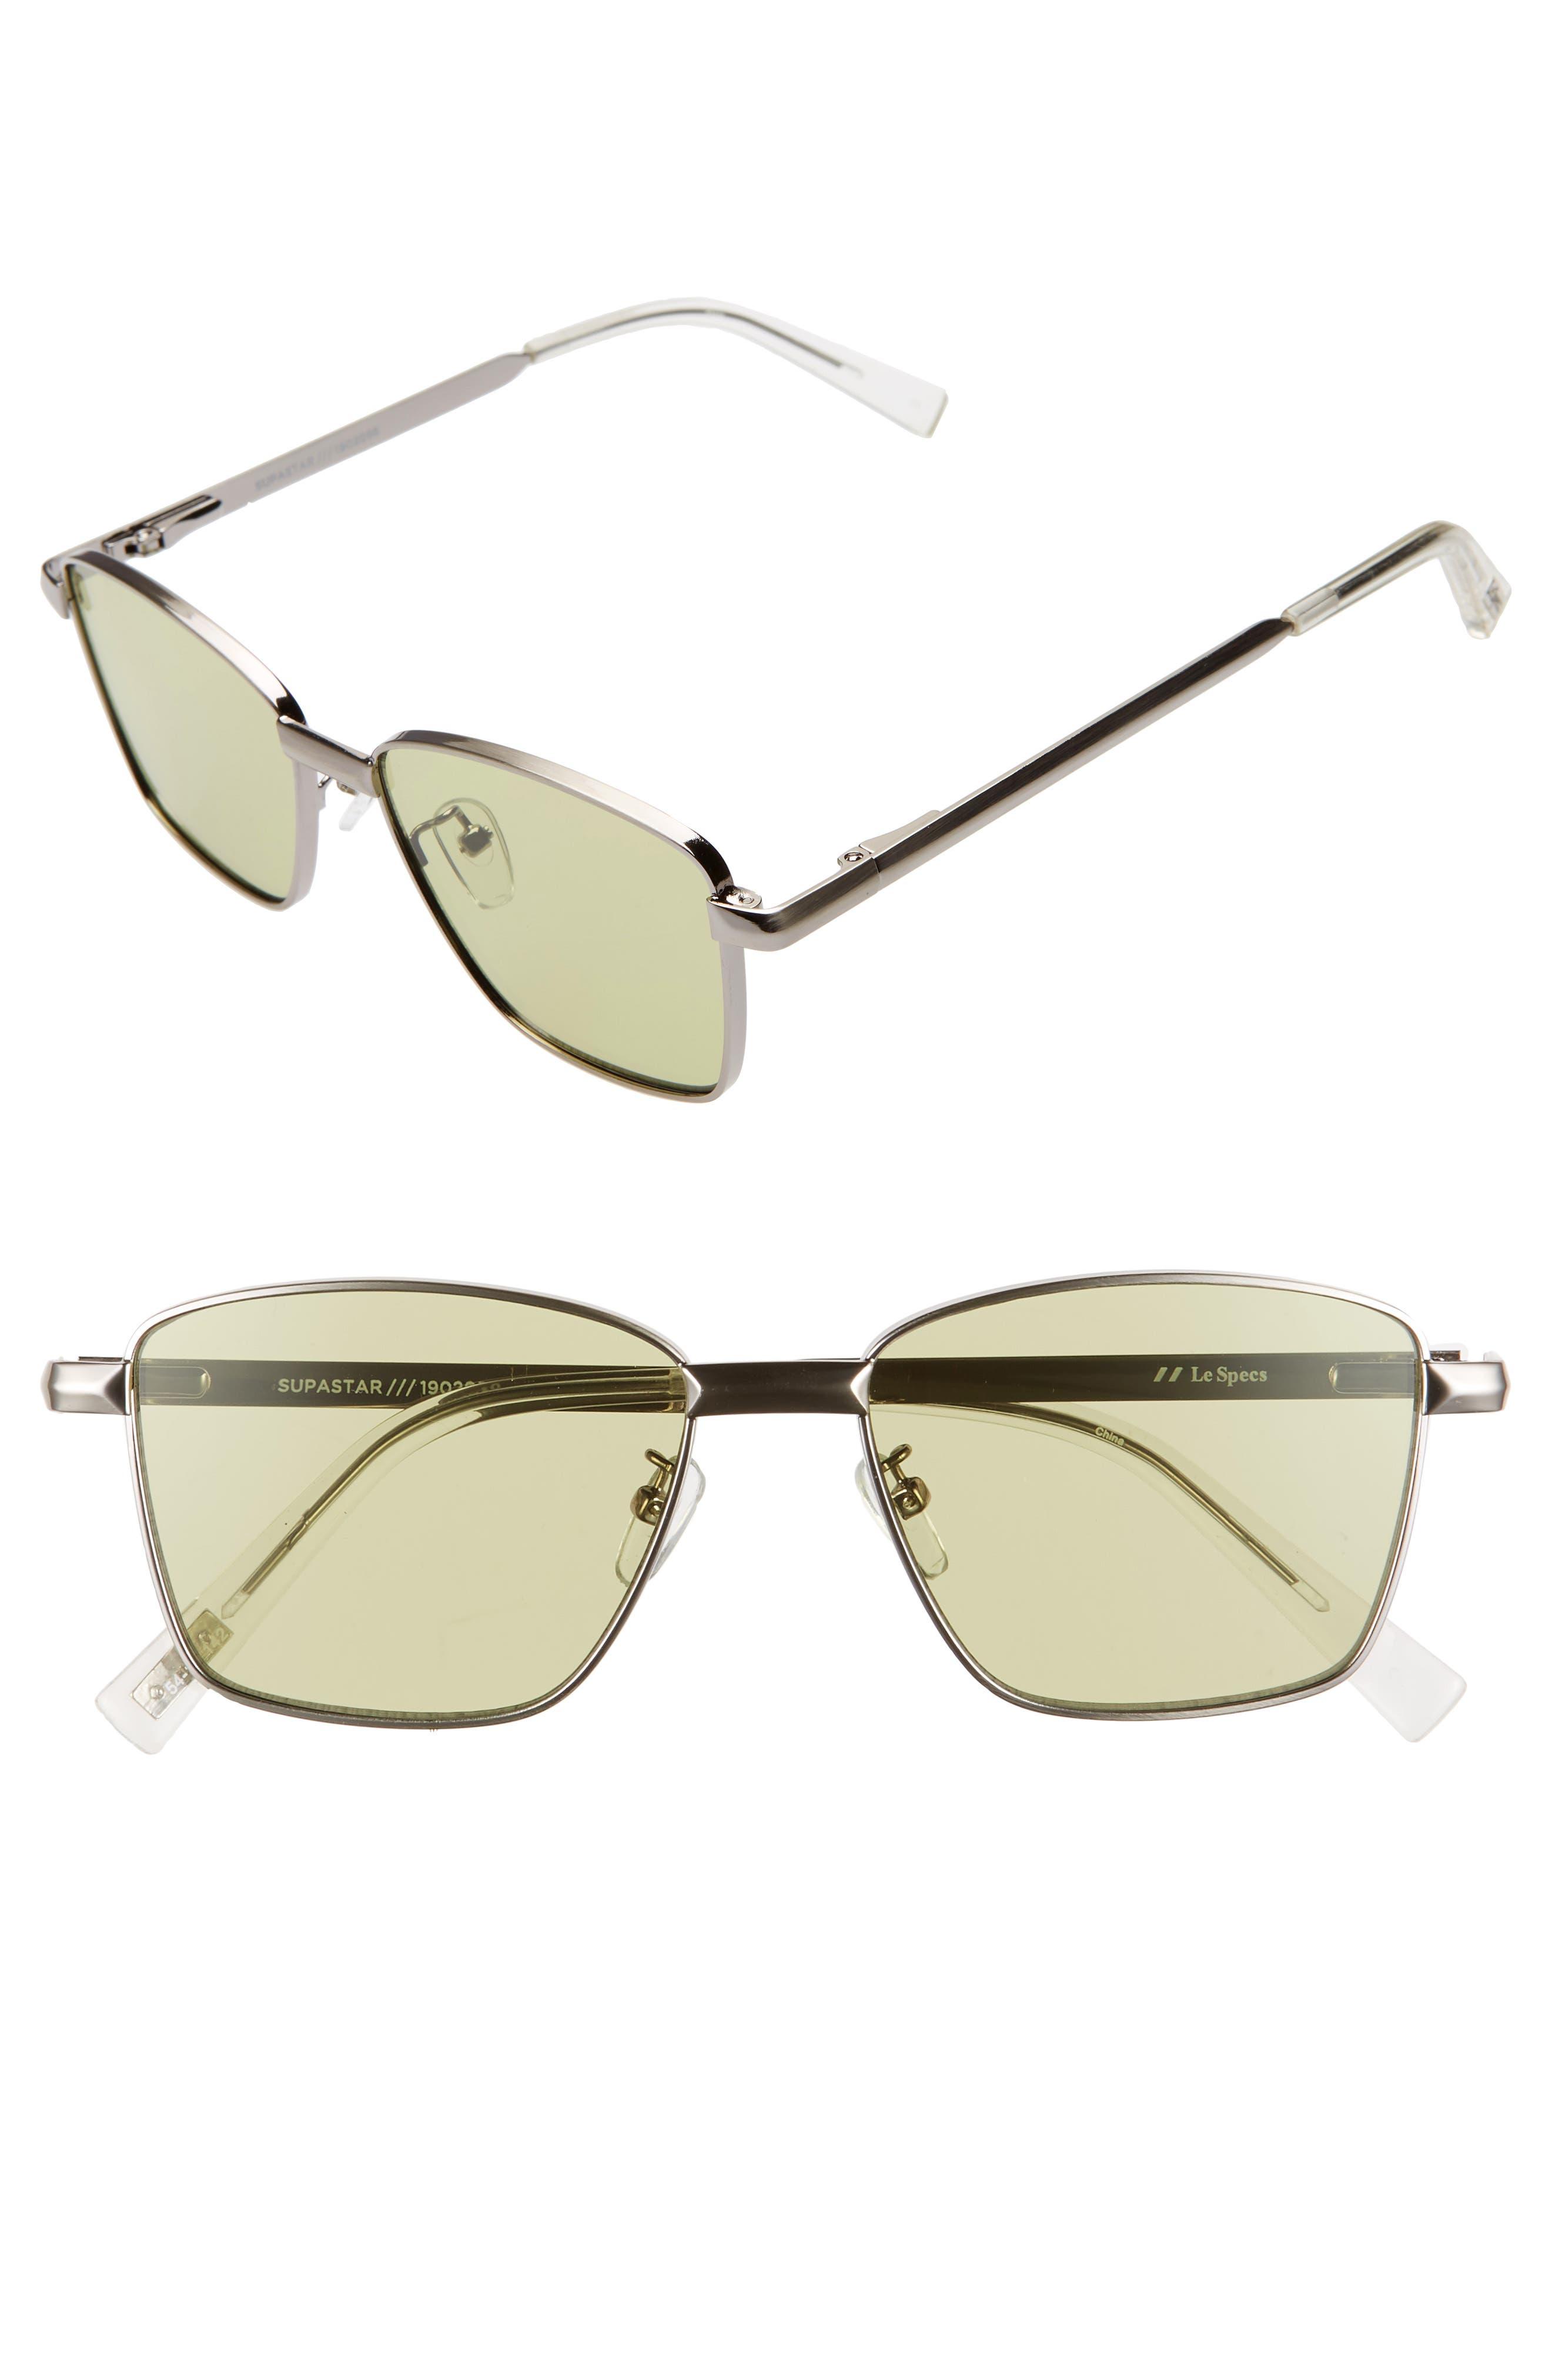 Le Specs Supastar 5m Tinted Square Sunglasses - Silver/ Green